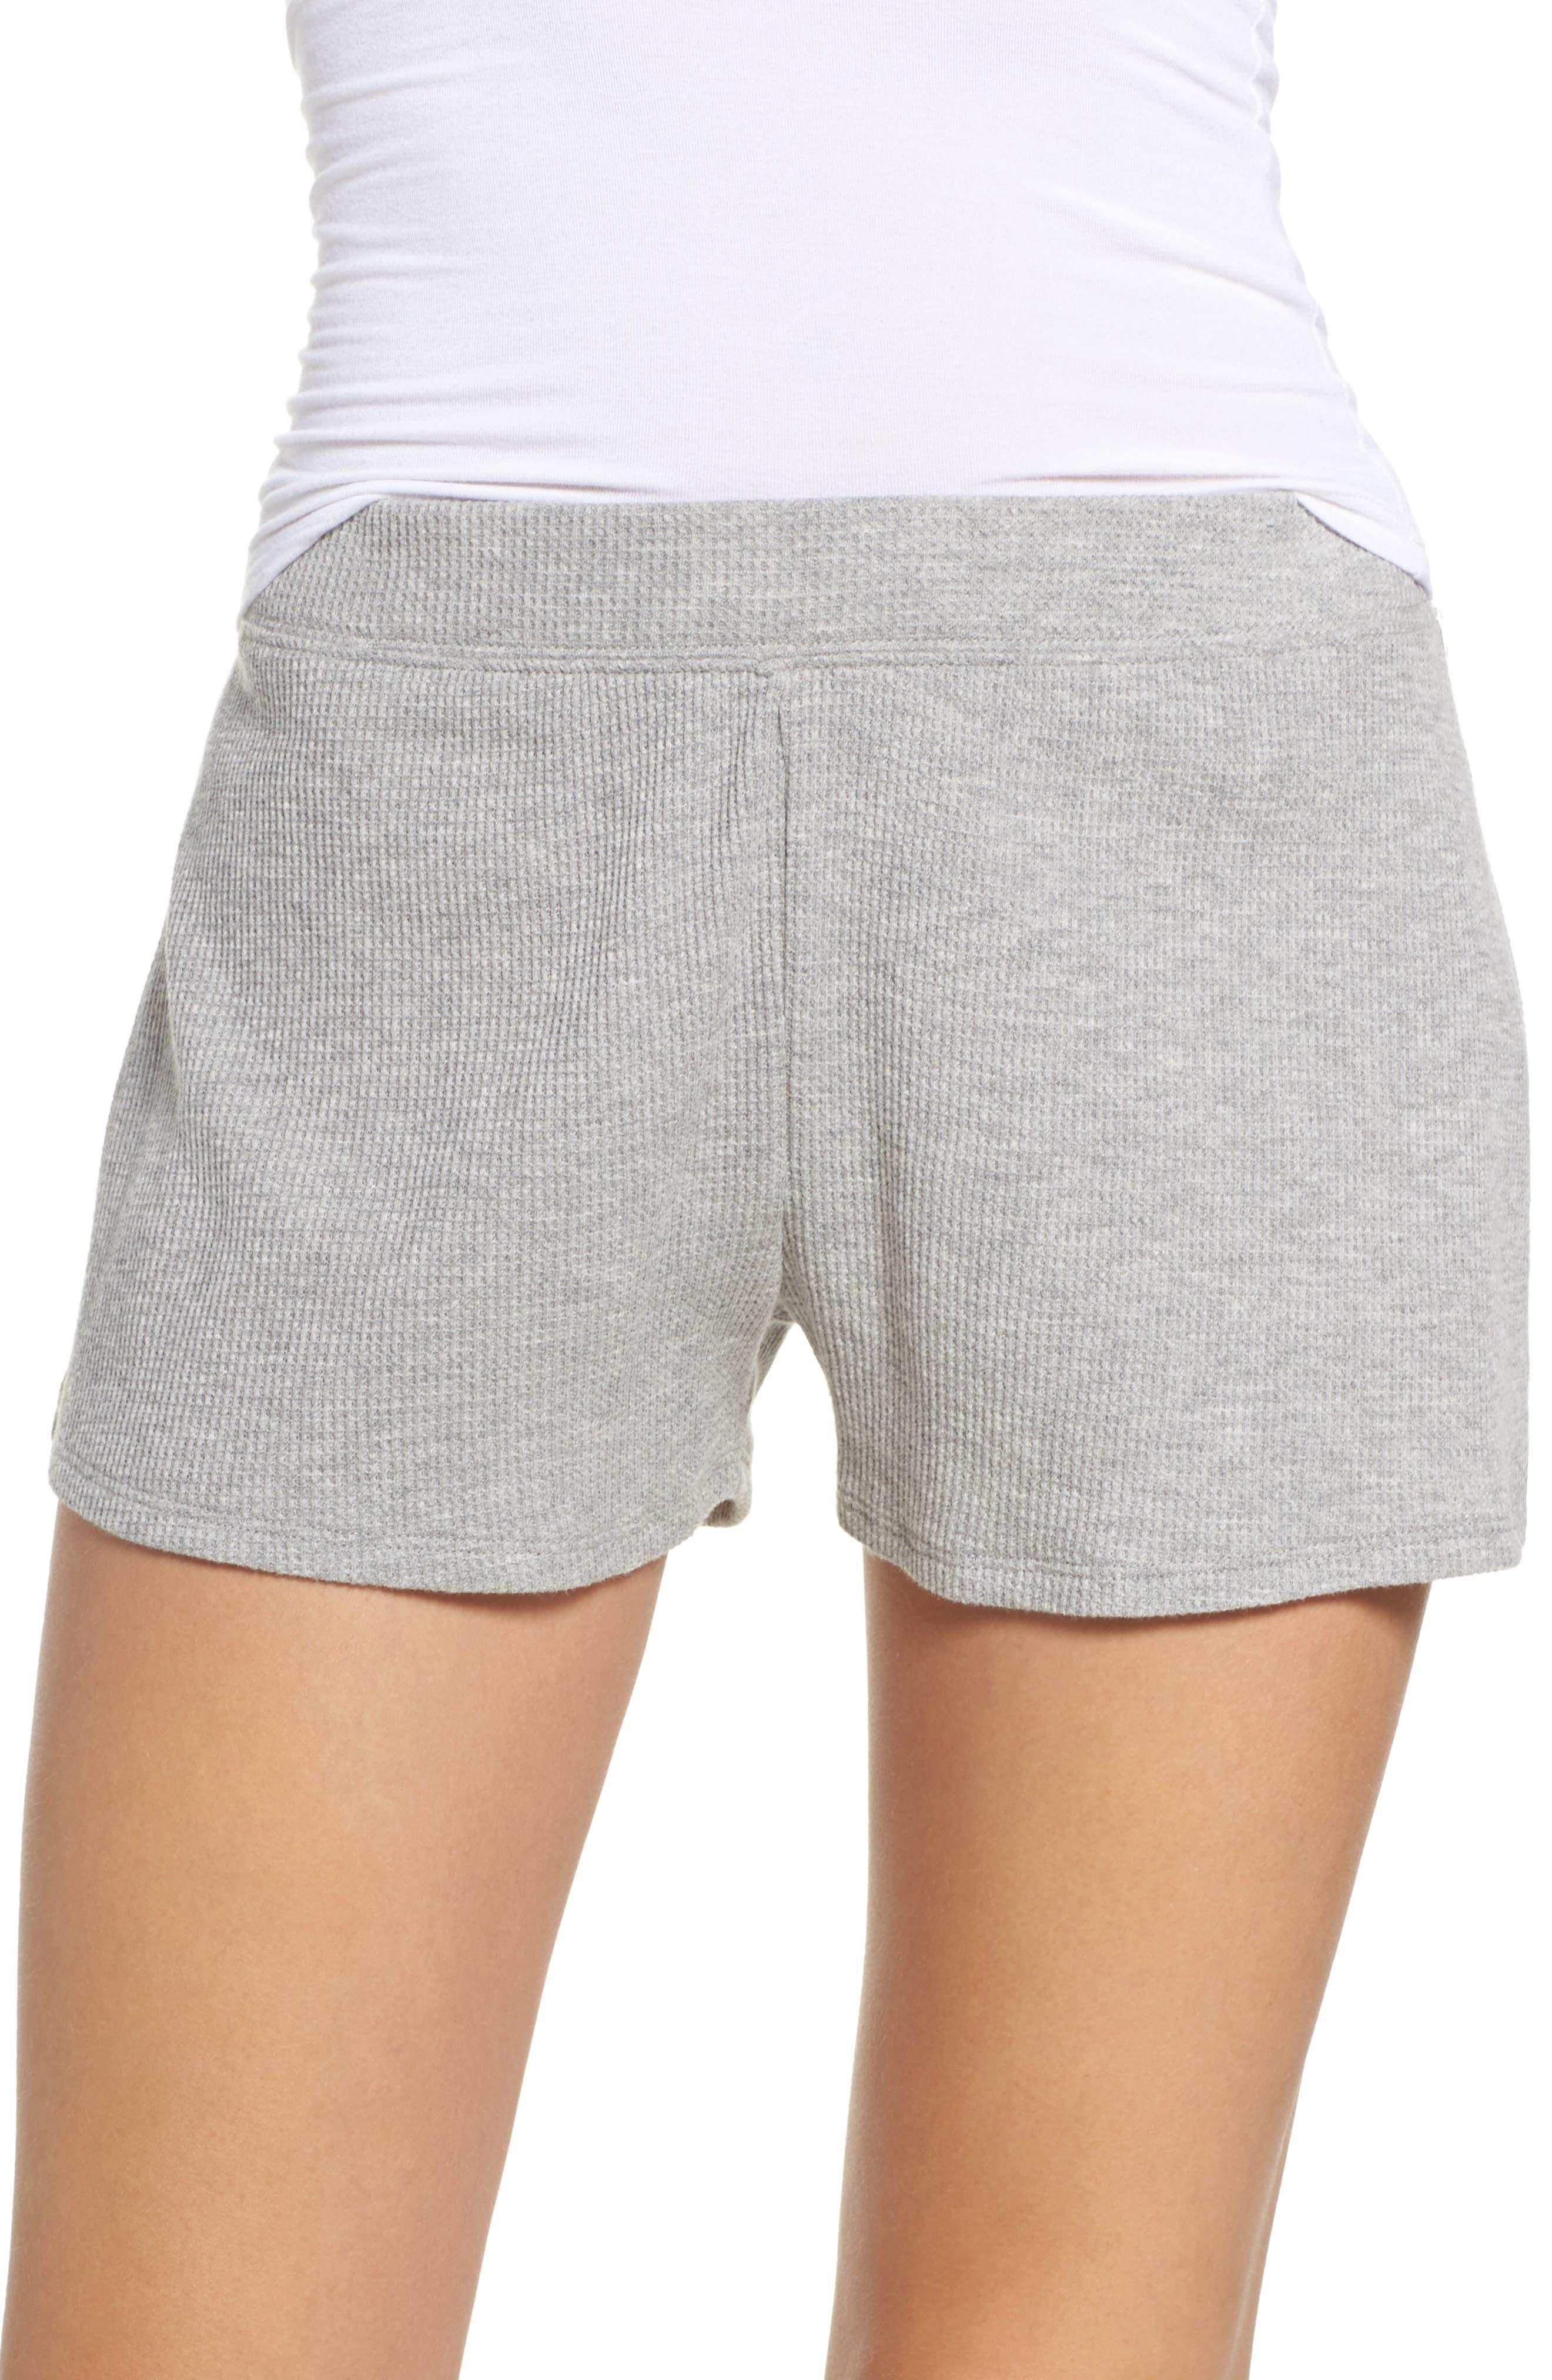 Waffle Knit Lounge Shorts,                             Main thumbnail 1, color,                             Heather Grey